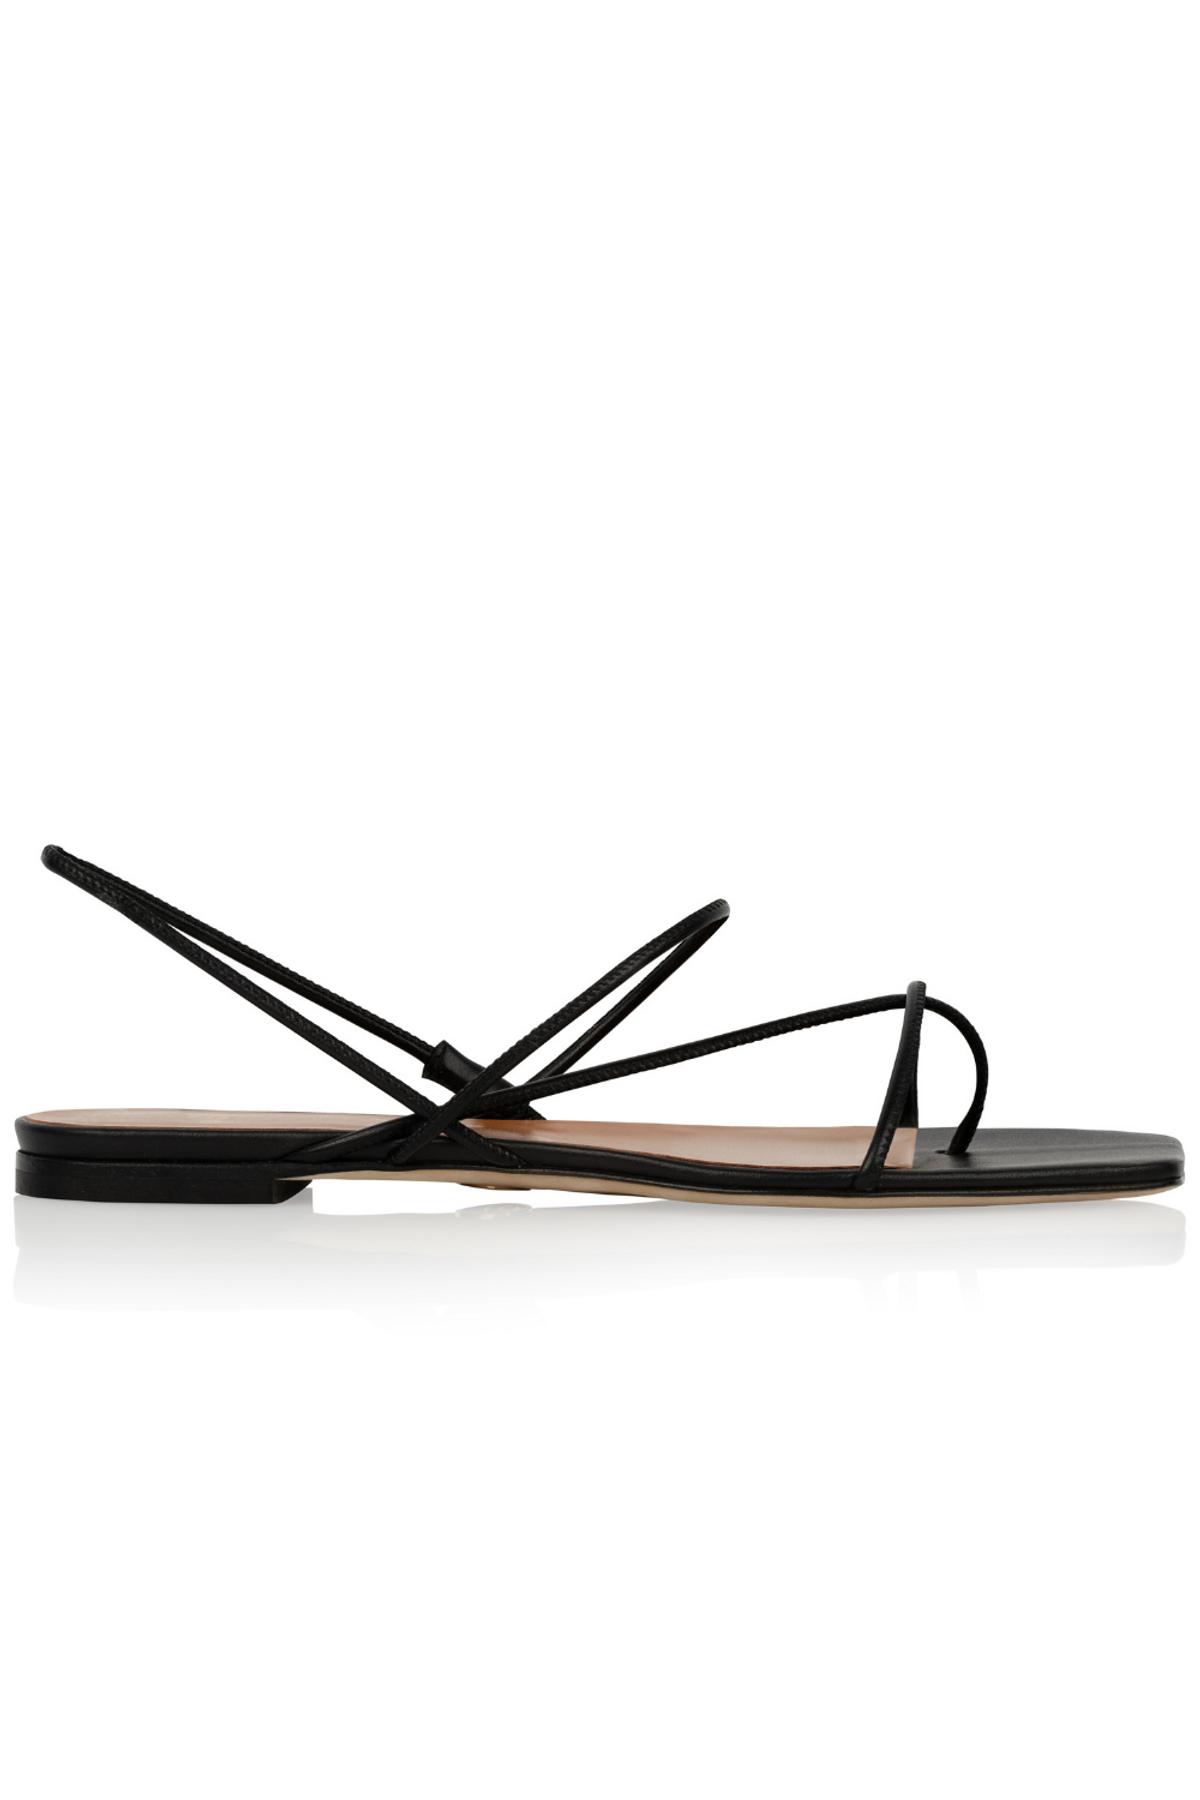 Trieste Sandal